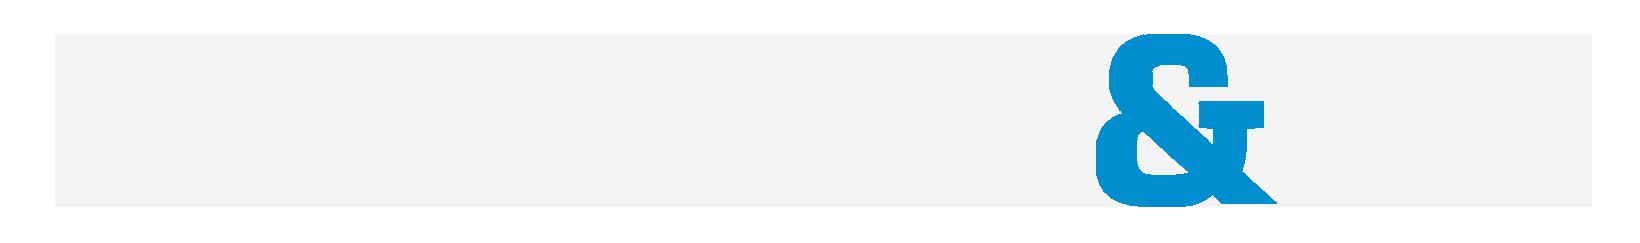 Service & Co.'s logo